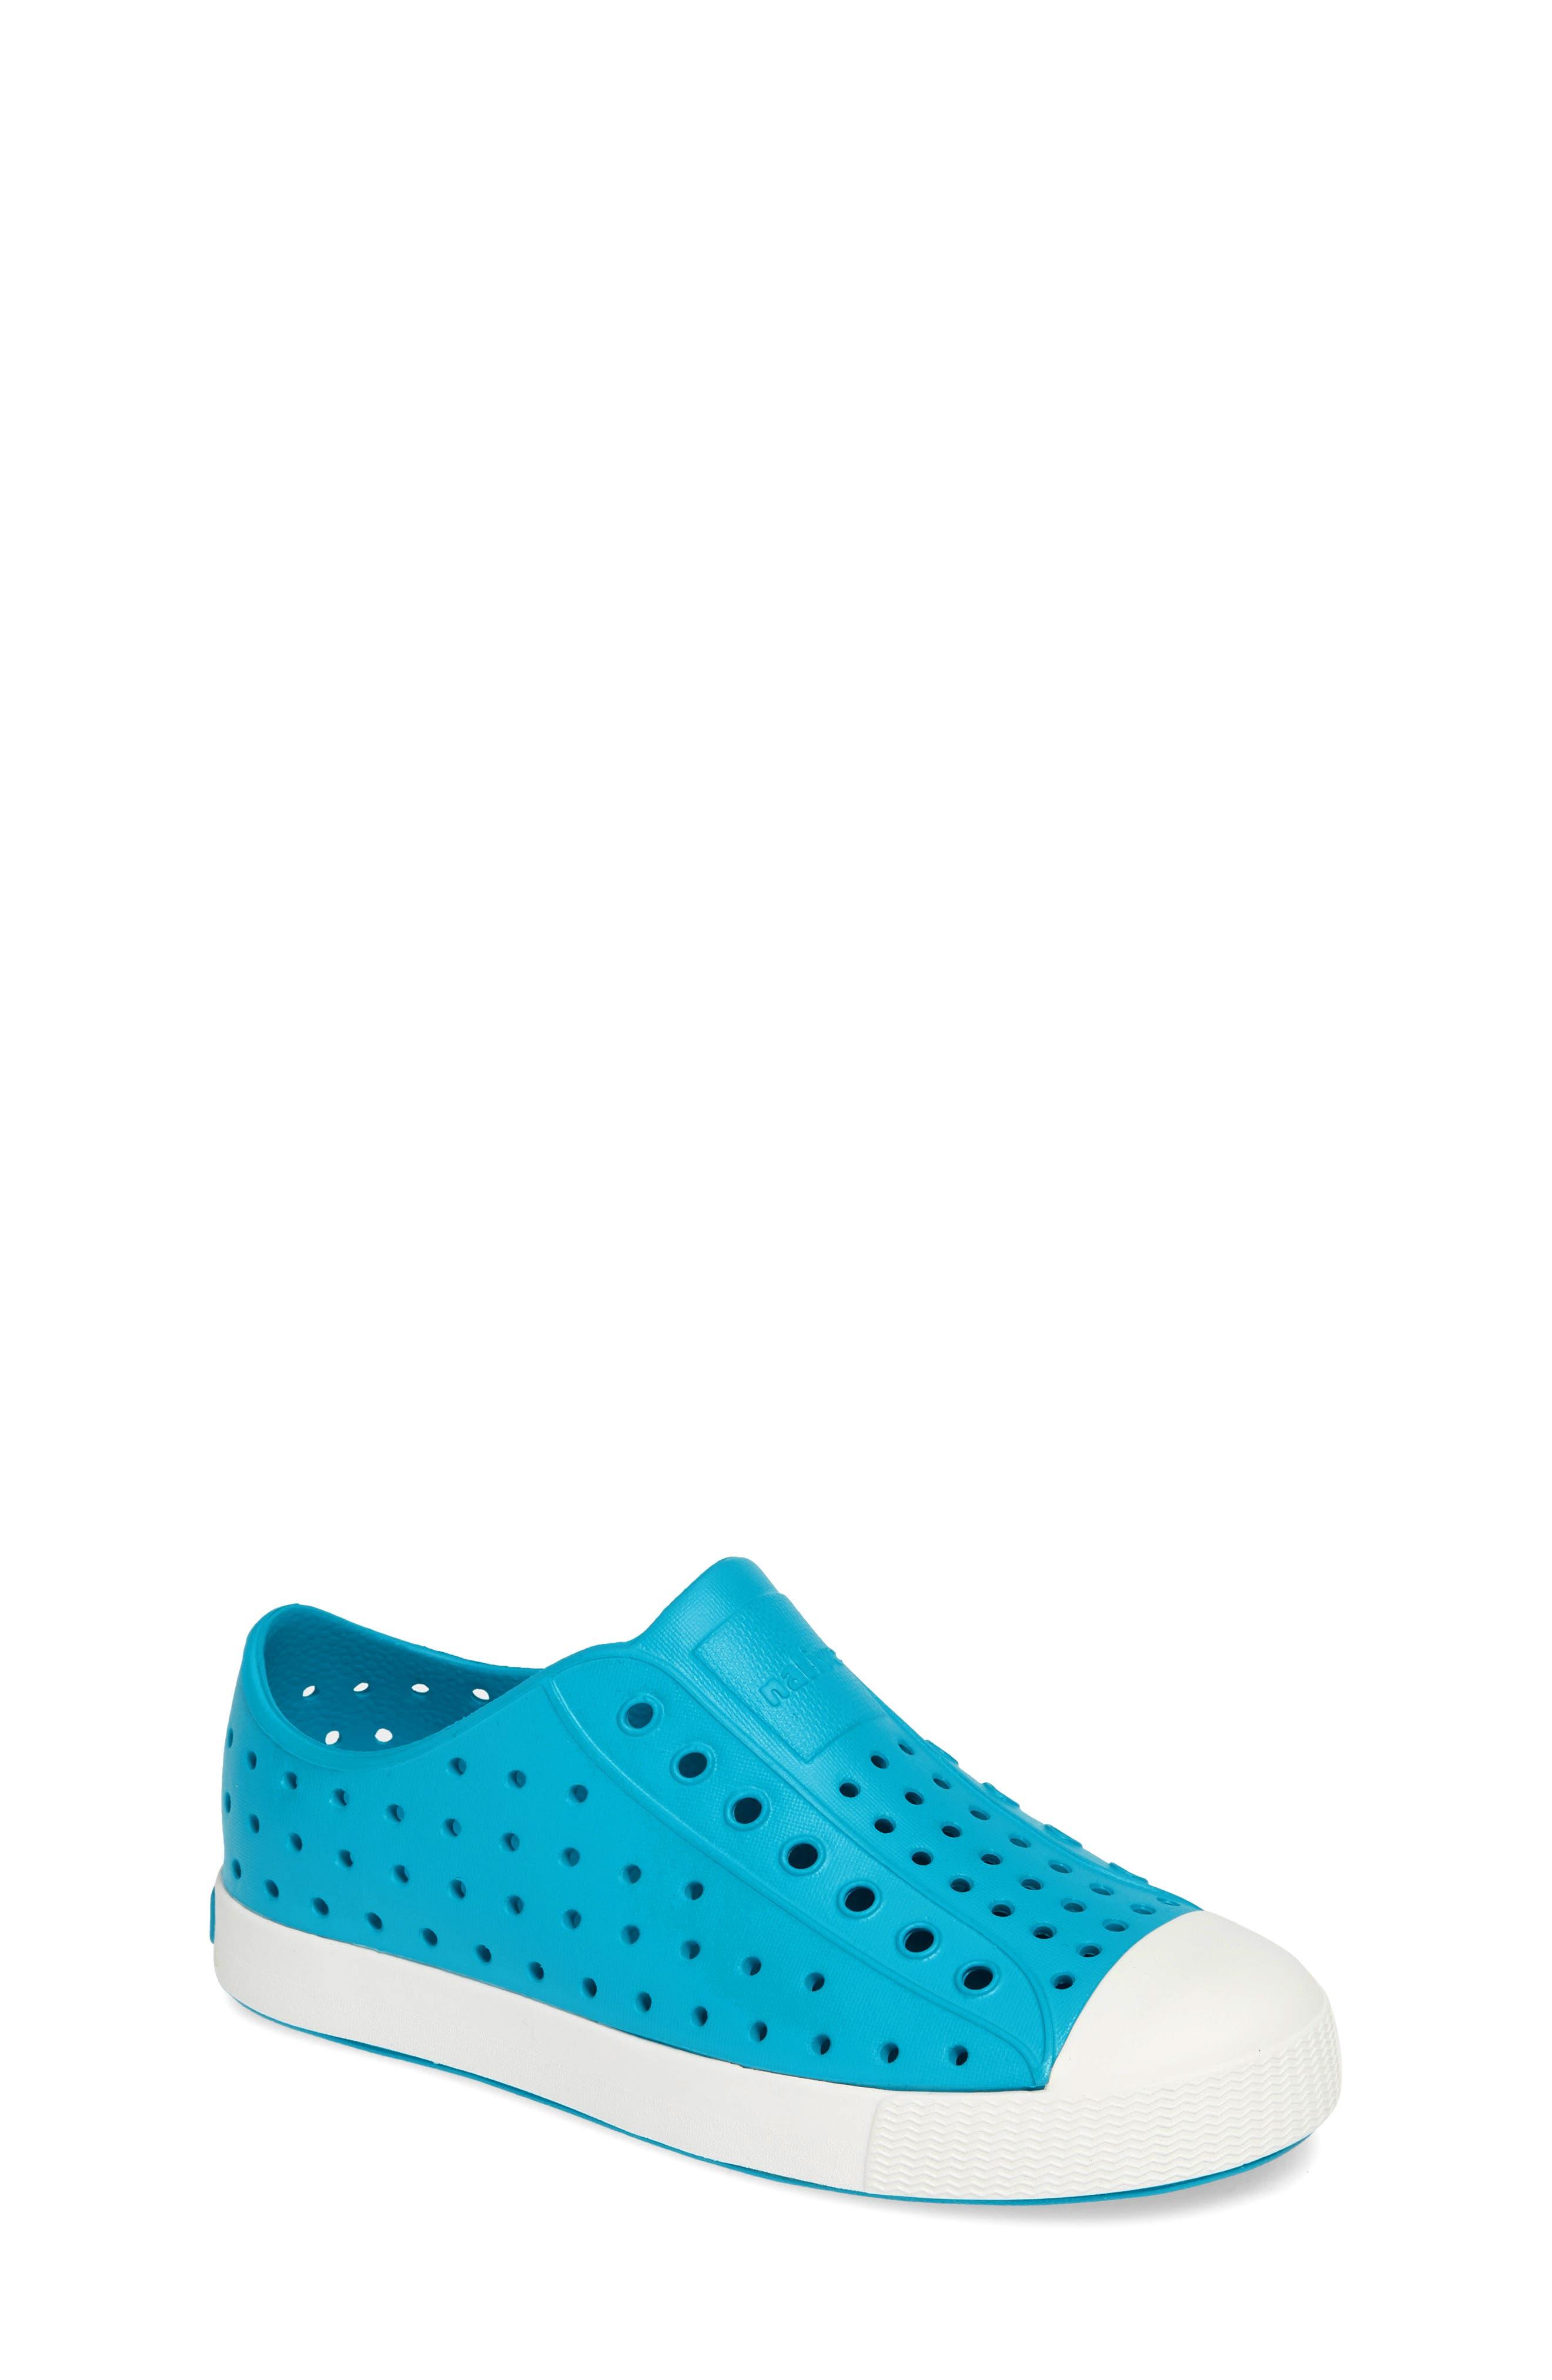 'Jefferson' Water Friendly Slip-On Sneaker,                             Main thumbnail 48, color,